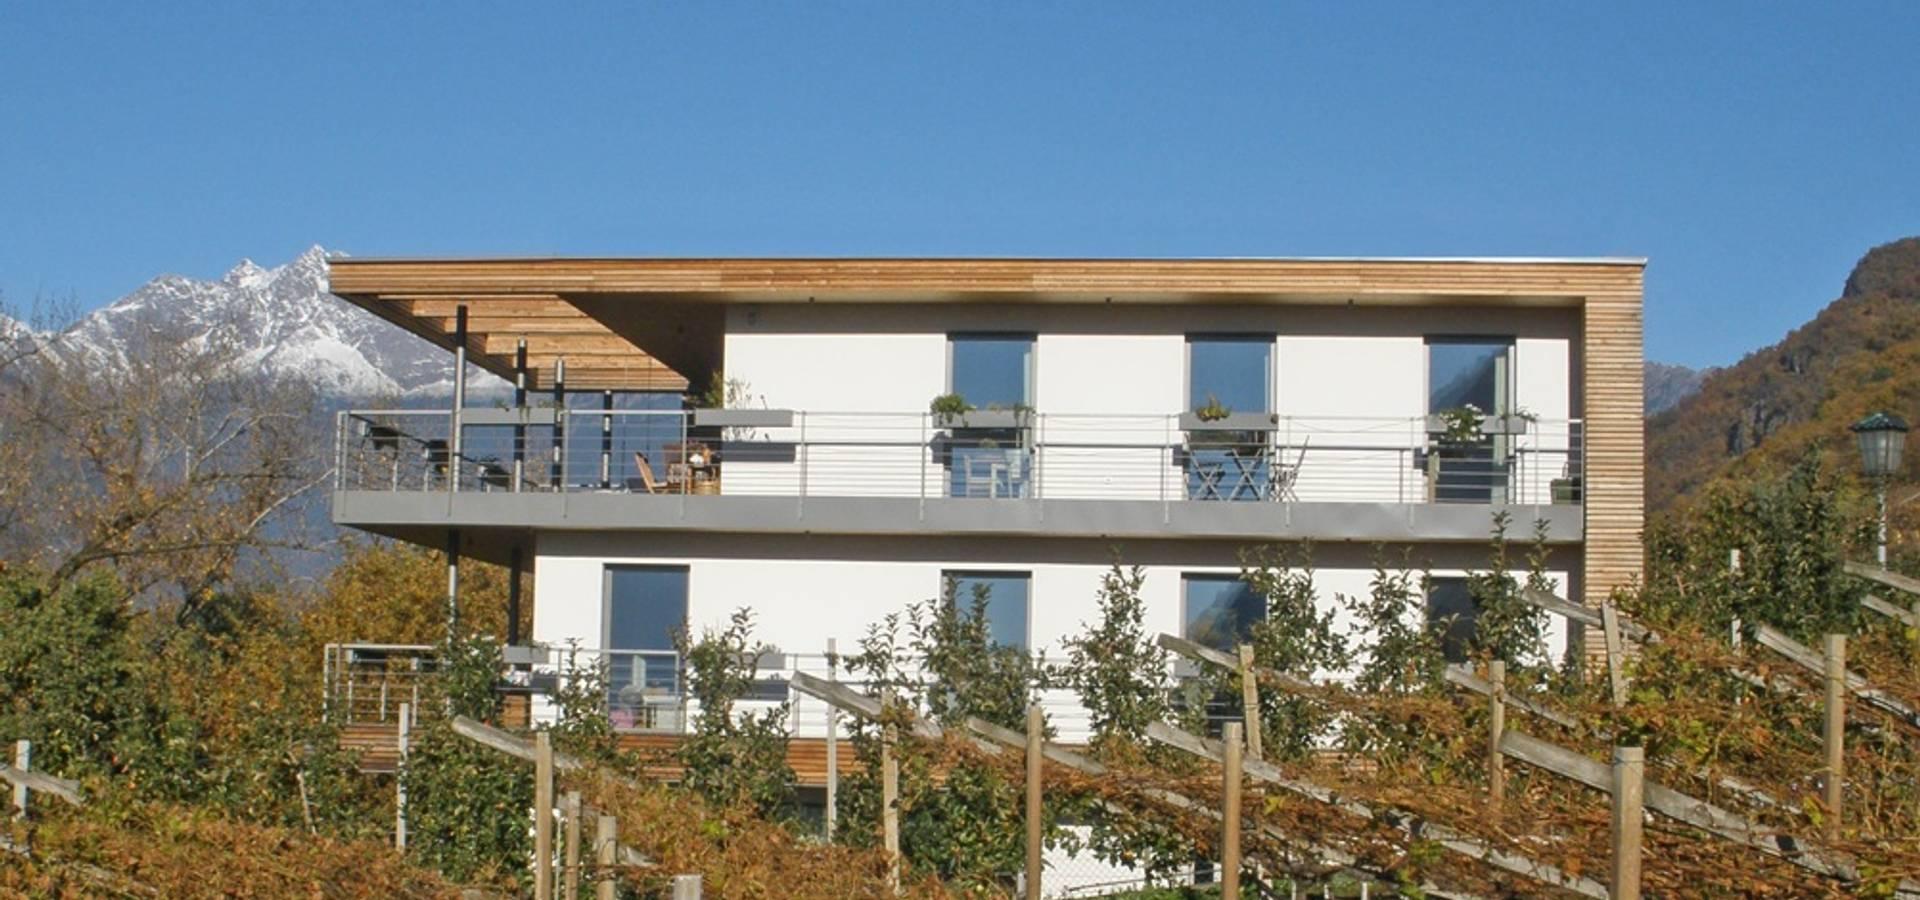 melle-metzen architects